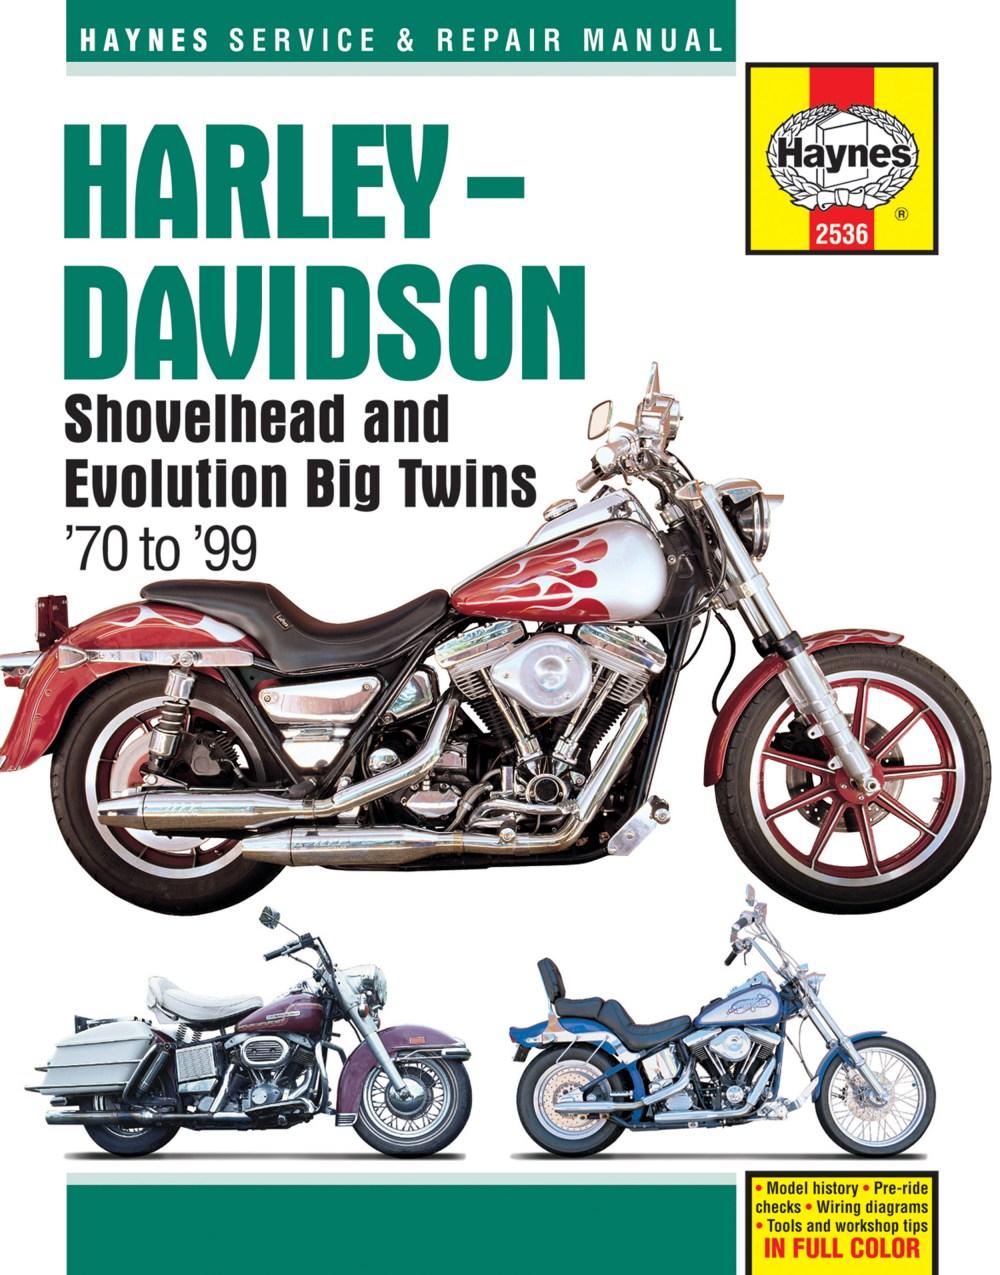 medium resolution of enlarge harley davidson shovelhead and evolution